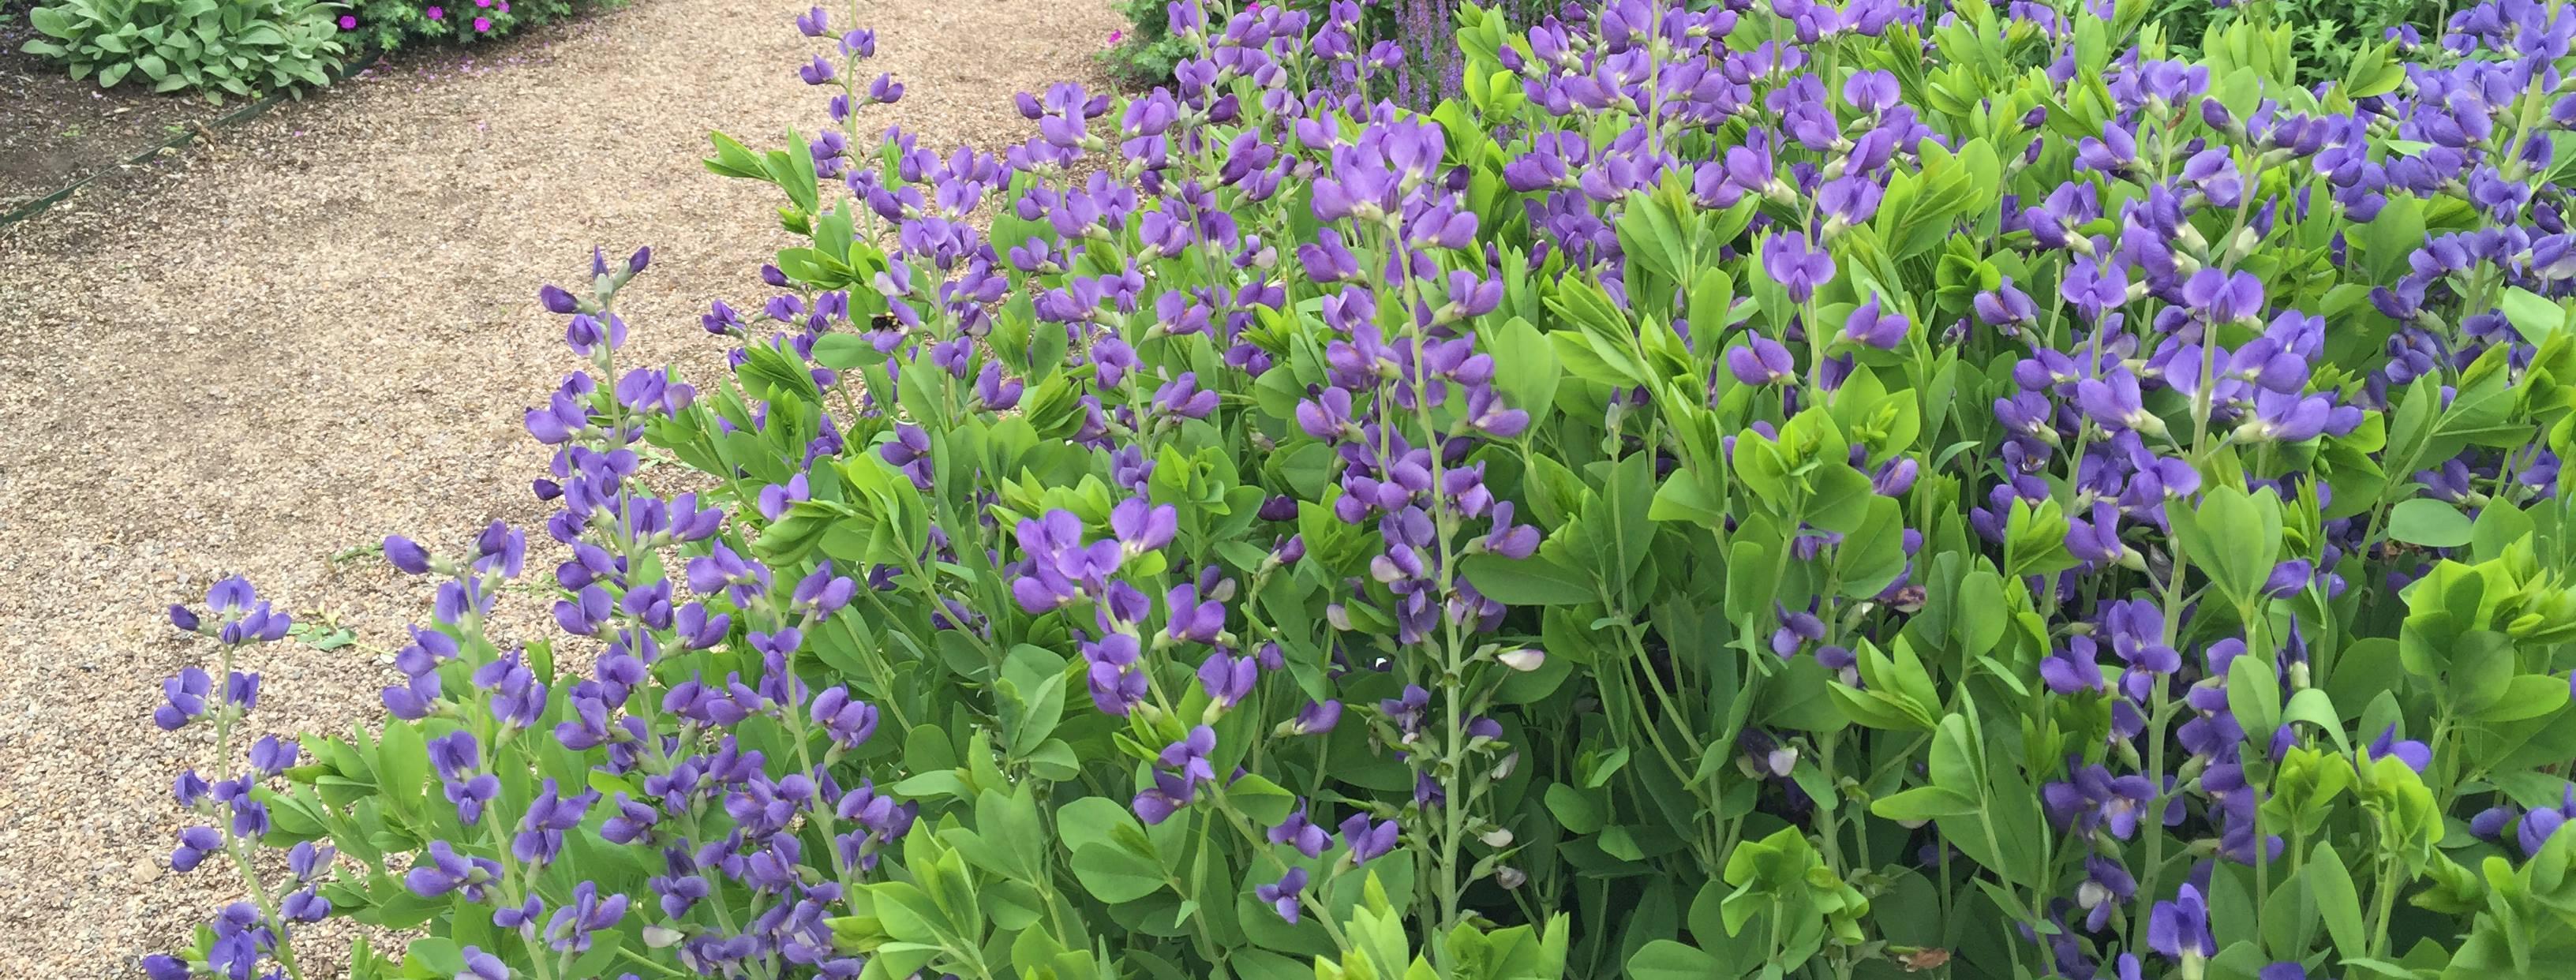 Gardeners Supply - Gardeners Supply Promotion Code Free Shipping